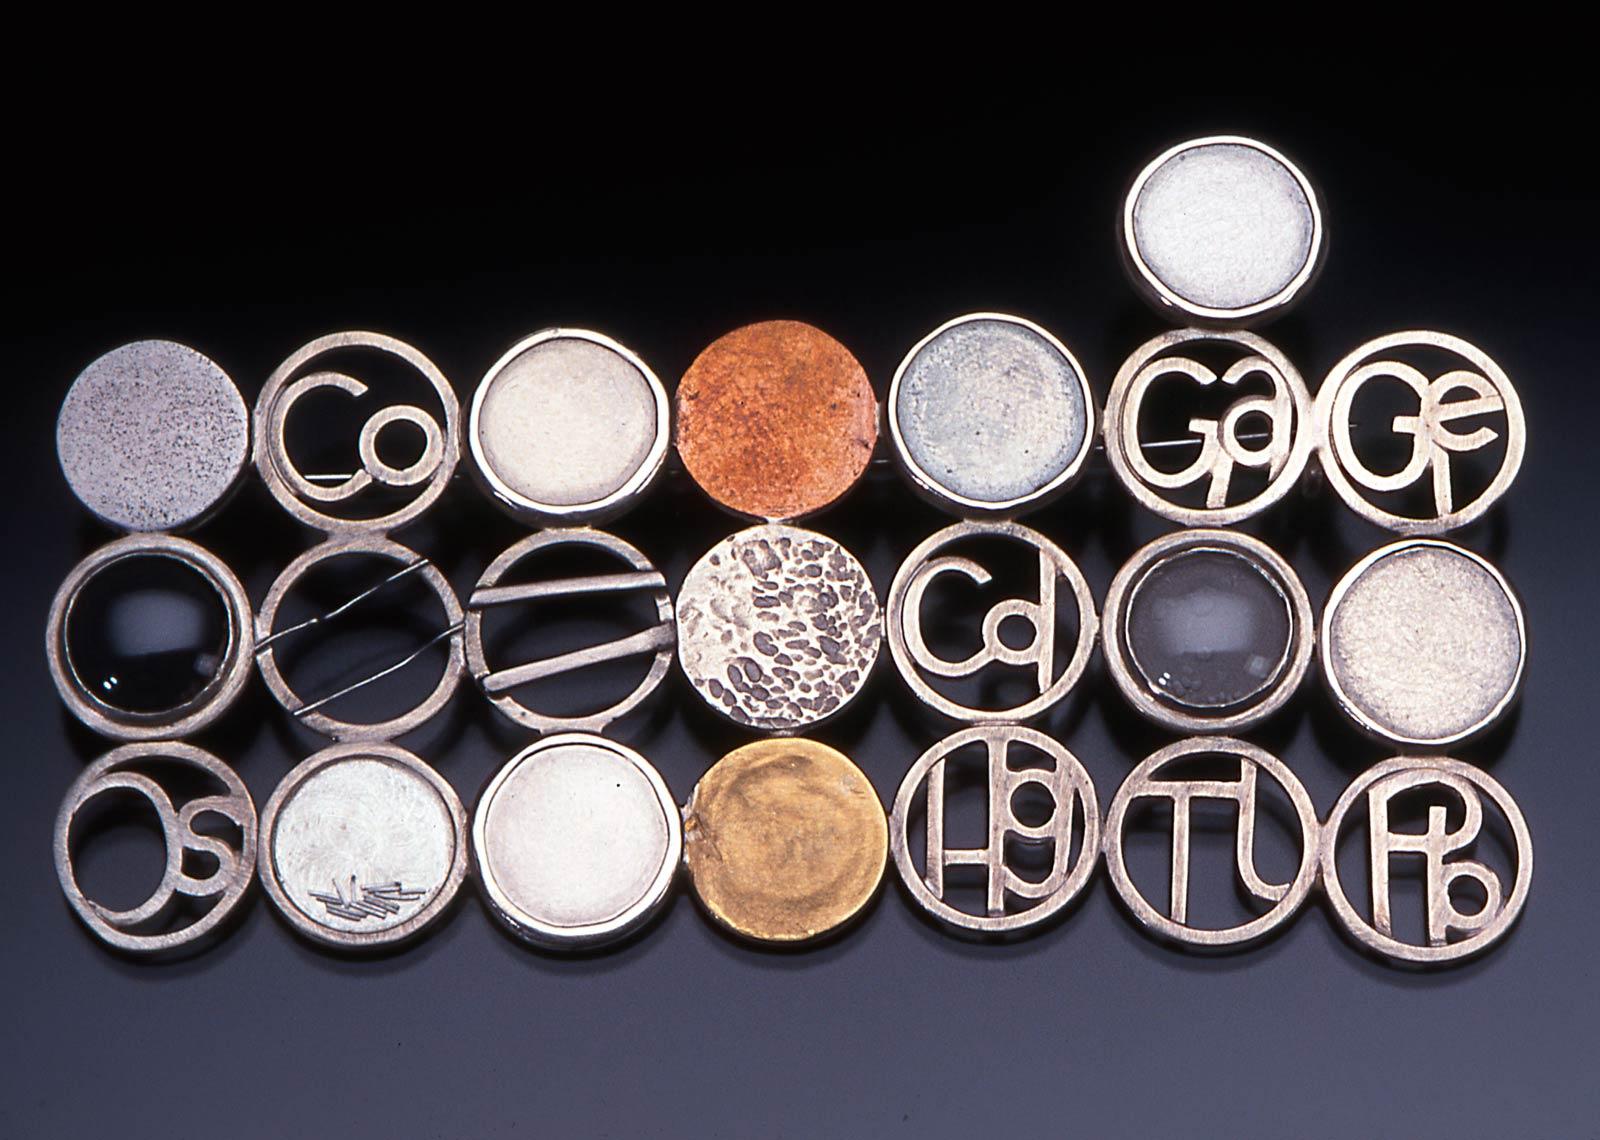 TRACE ELEMENTS 1 BROOCH of fabricated sterling silver set with aluminum, iron, nickel, copper, zinc, ruthenium, rhodium, palladium, silver, indium, tin, iridium, platinum, gold, 8.4 x 4.5 x 0.5 centimeters, 2000.